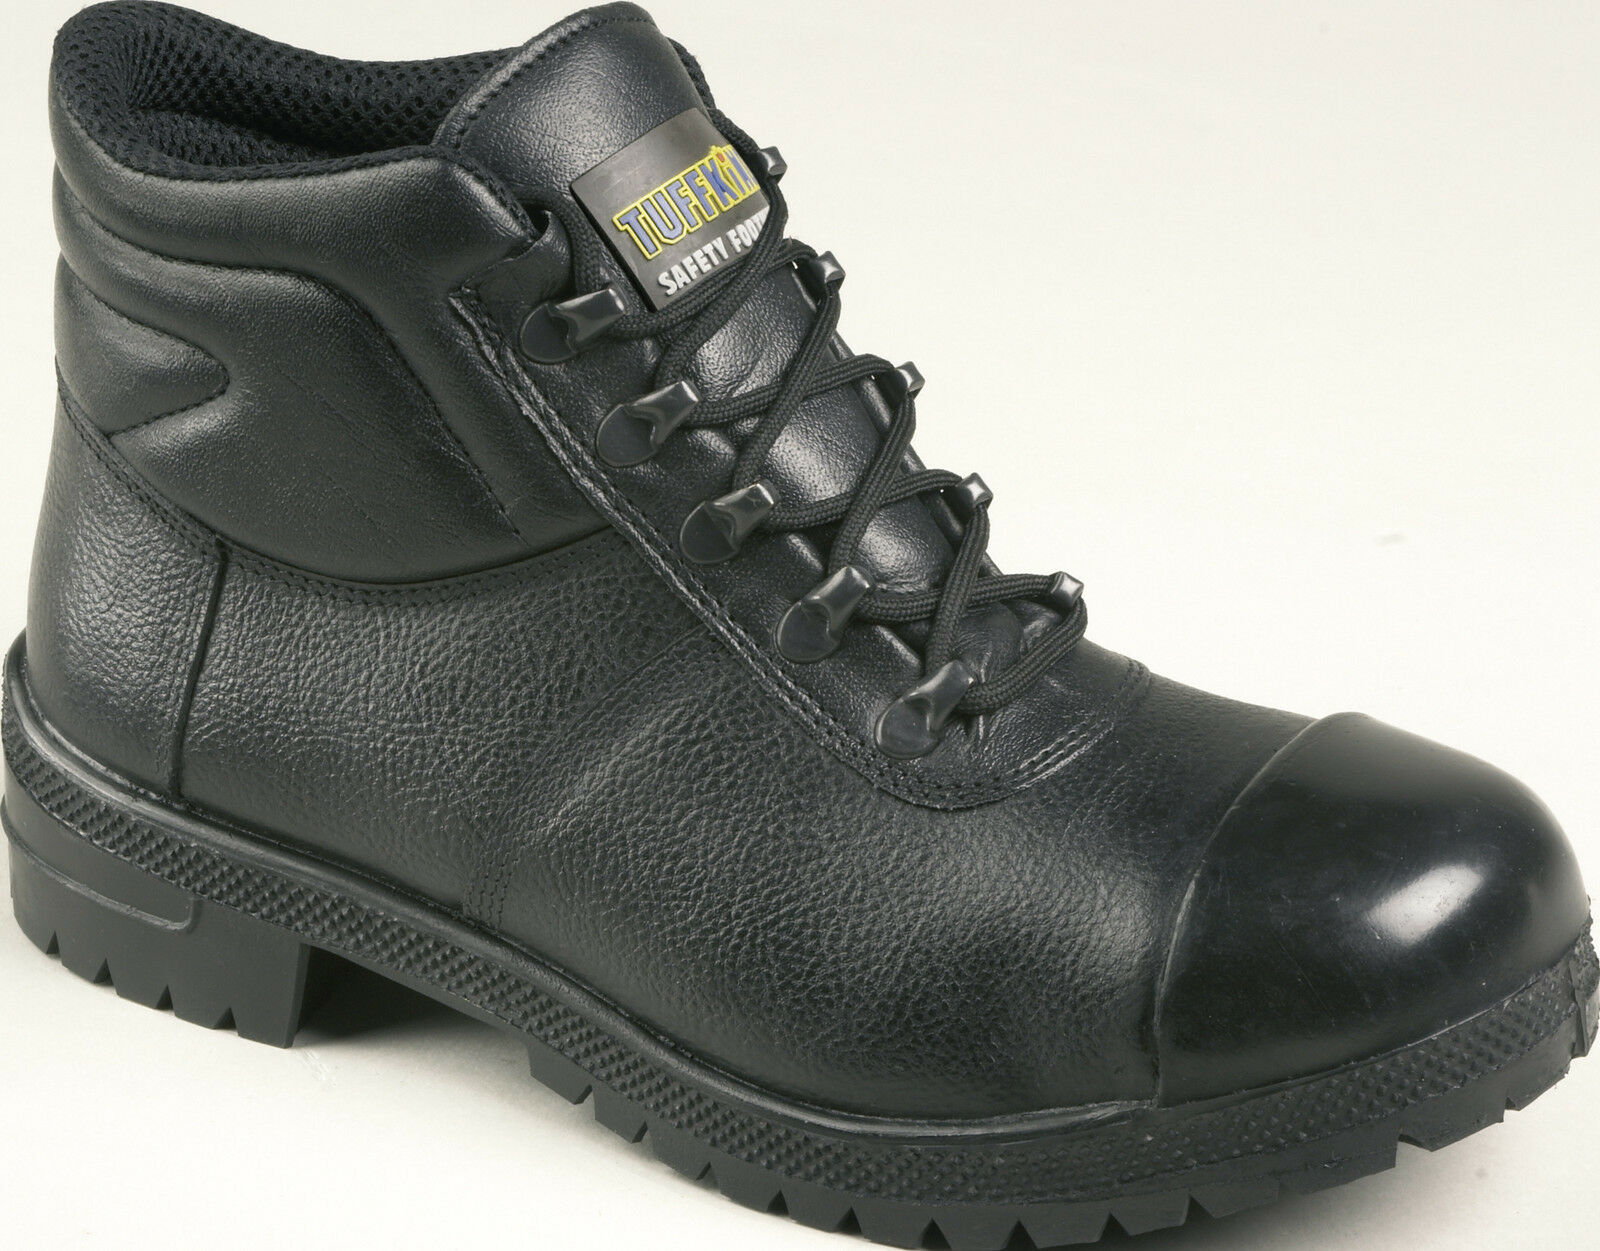 Tuffking puntera 3110 S3 Negro Acero puntera Tuffking de goma Bump PAC Botas De Seguridad Bota De Trabajo PPE 0d6e74